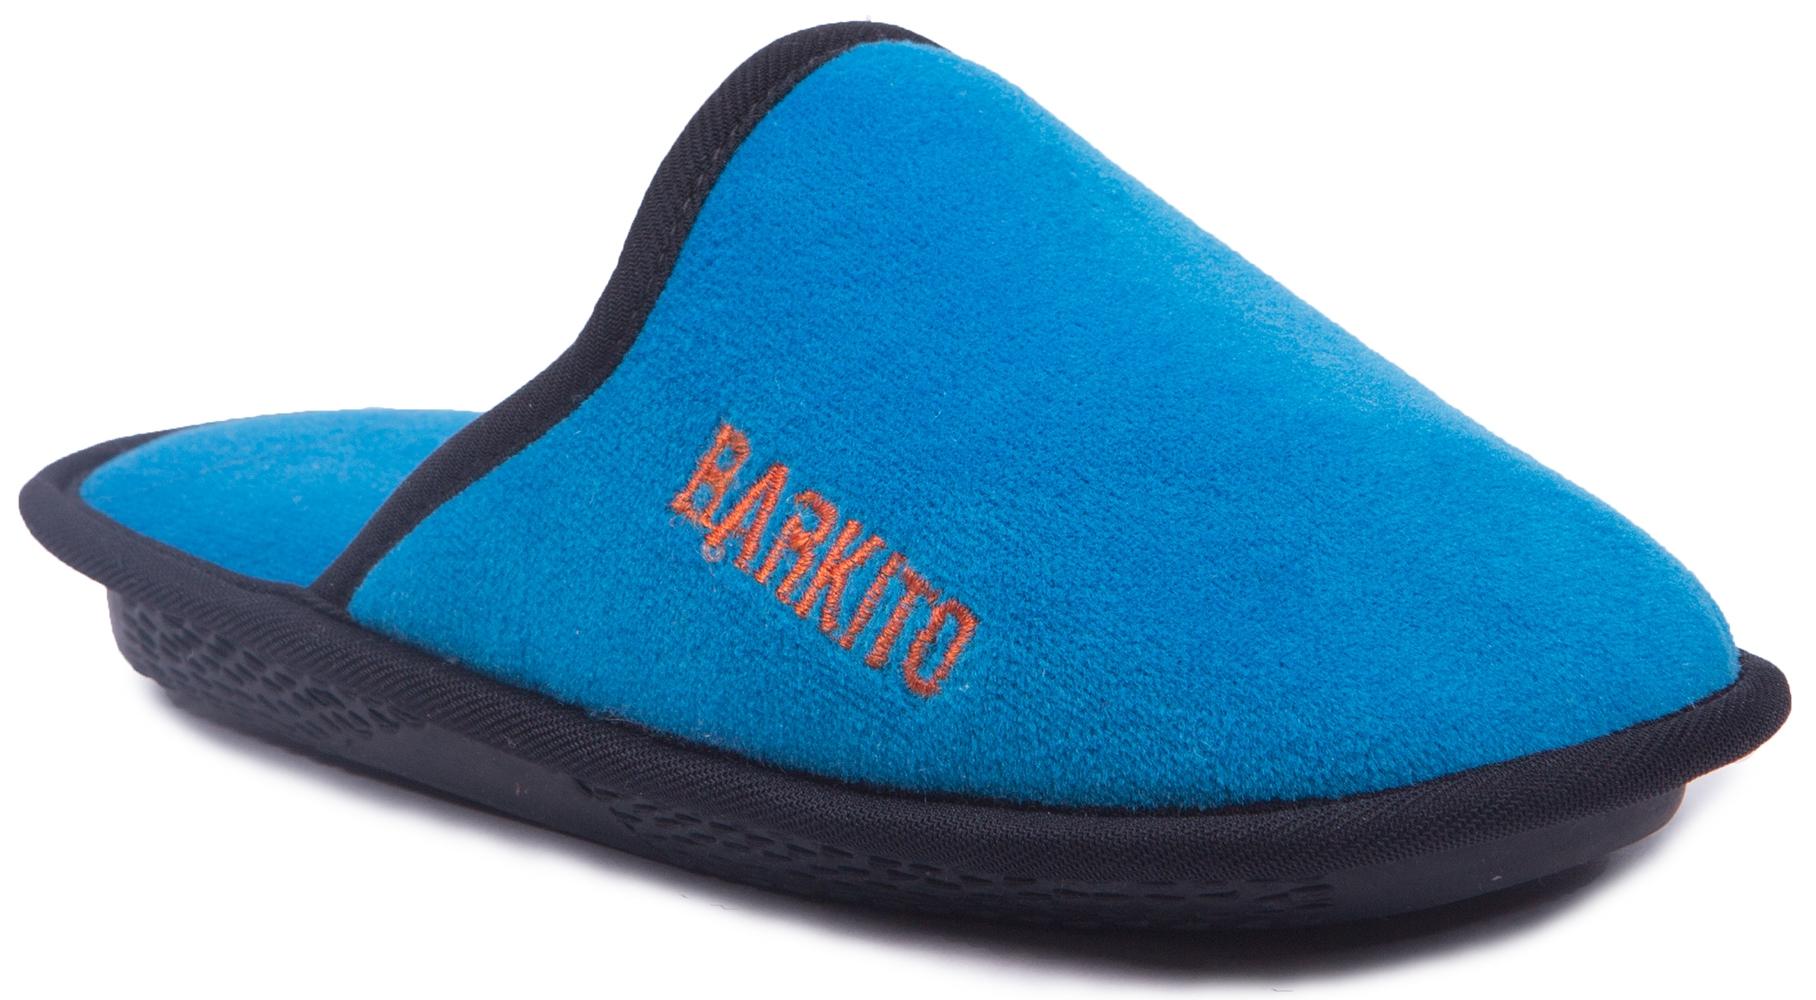 Пантолеты Barkito для мальчика пантолеты barkito frozen fz006559